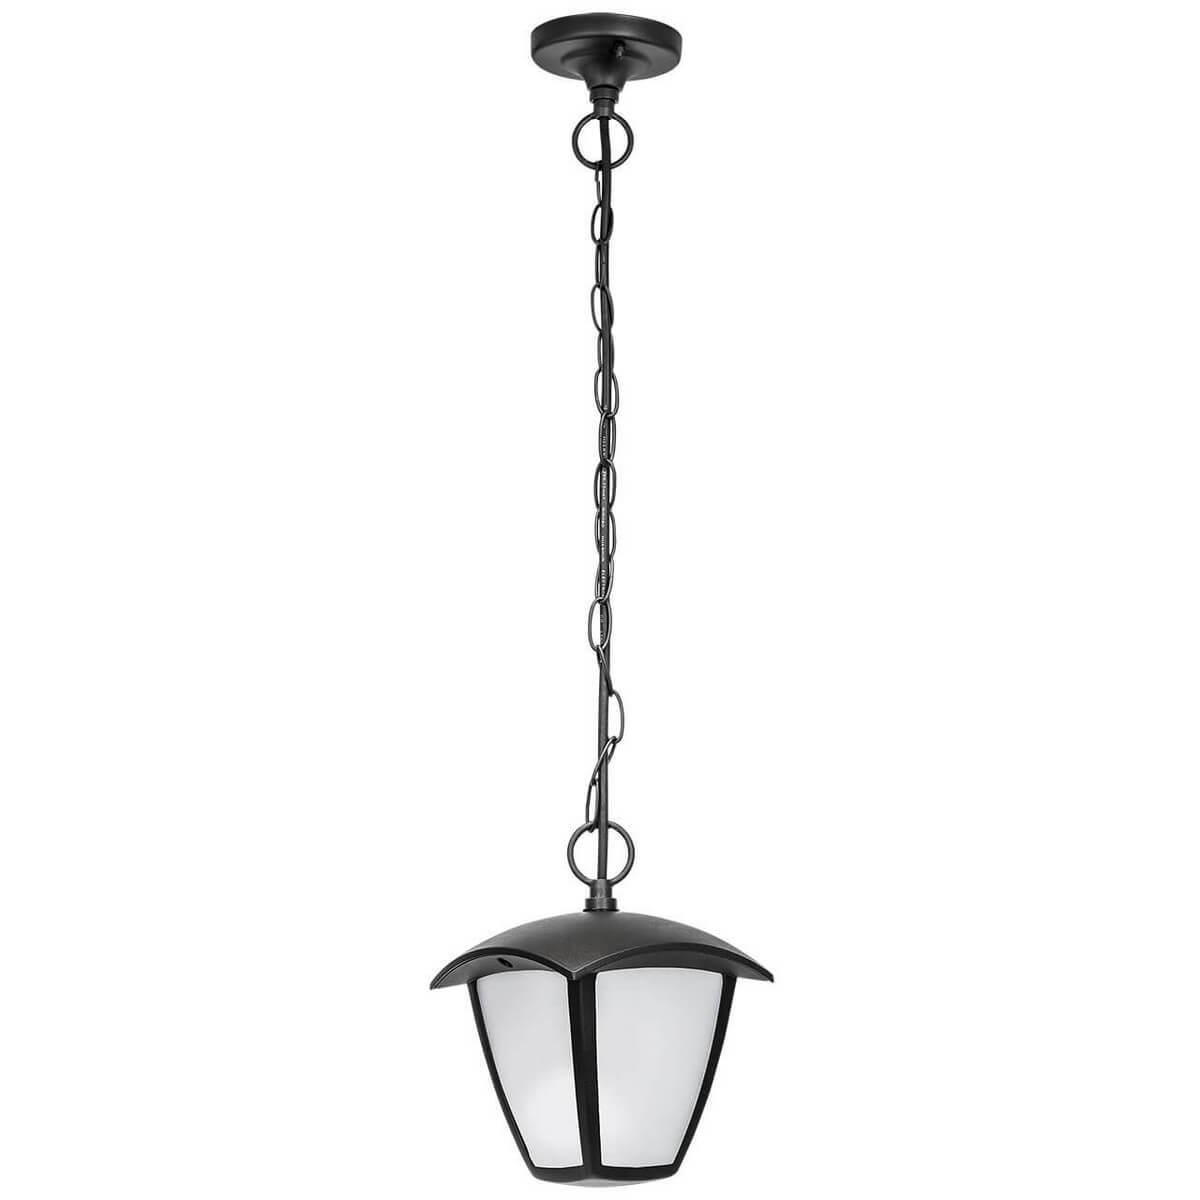 Уличный светильник Lightstar 375070, LED